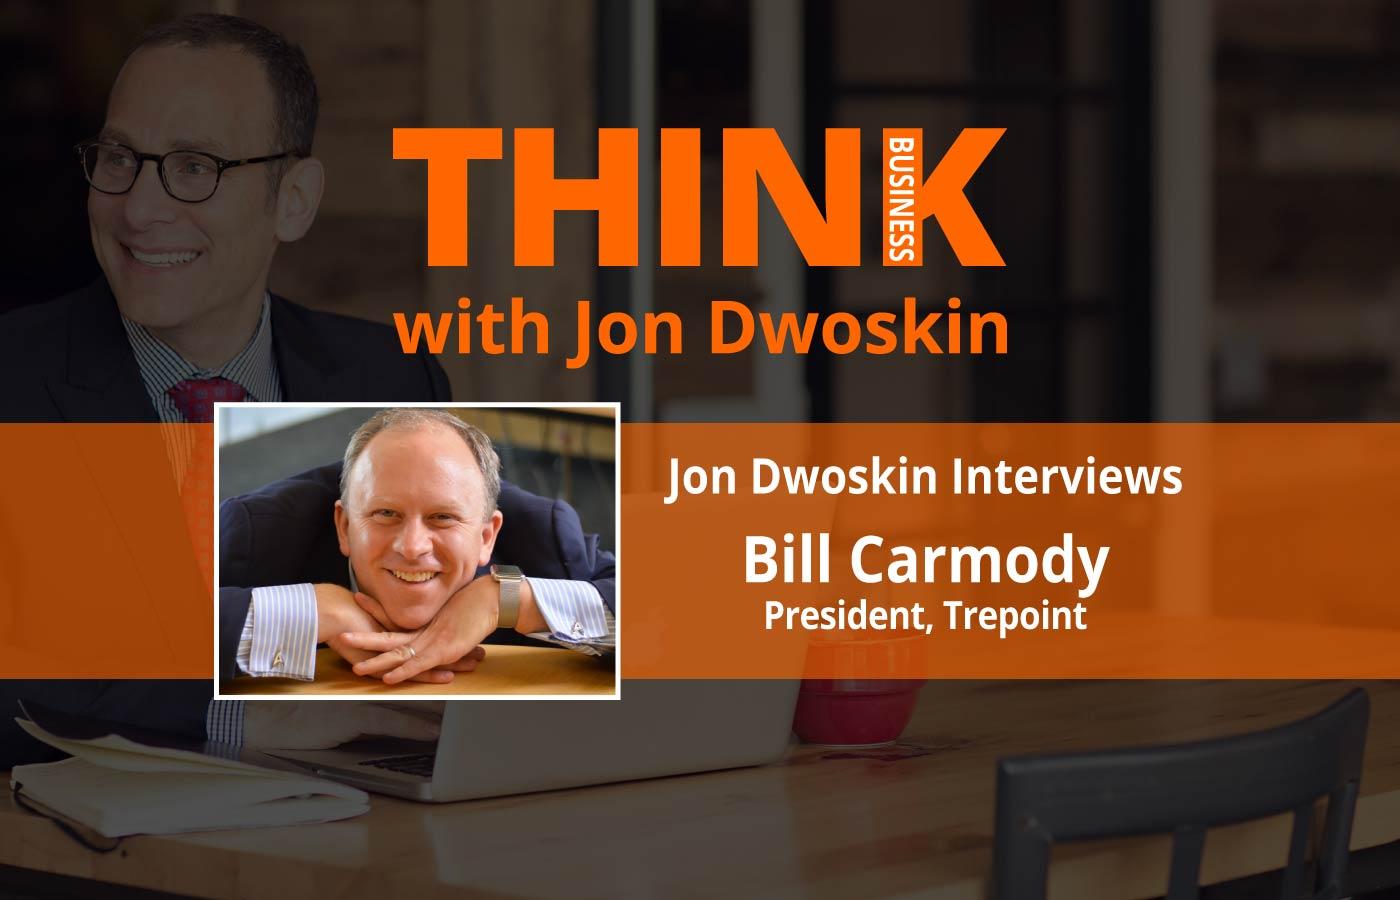 THINK Business: Jon Dwoskin Interviews Bill Carmody, President at Trepoint